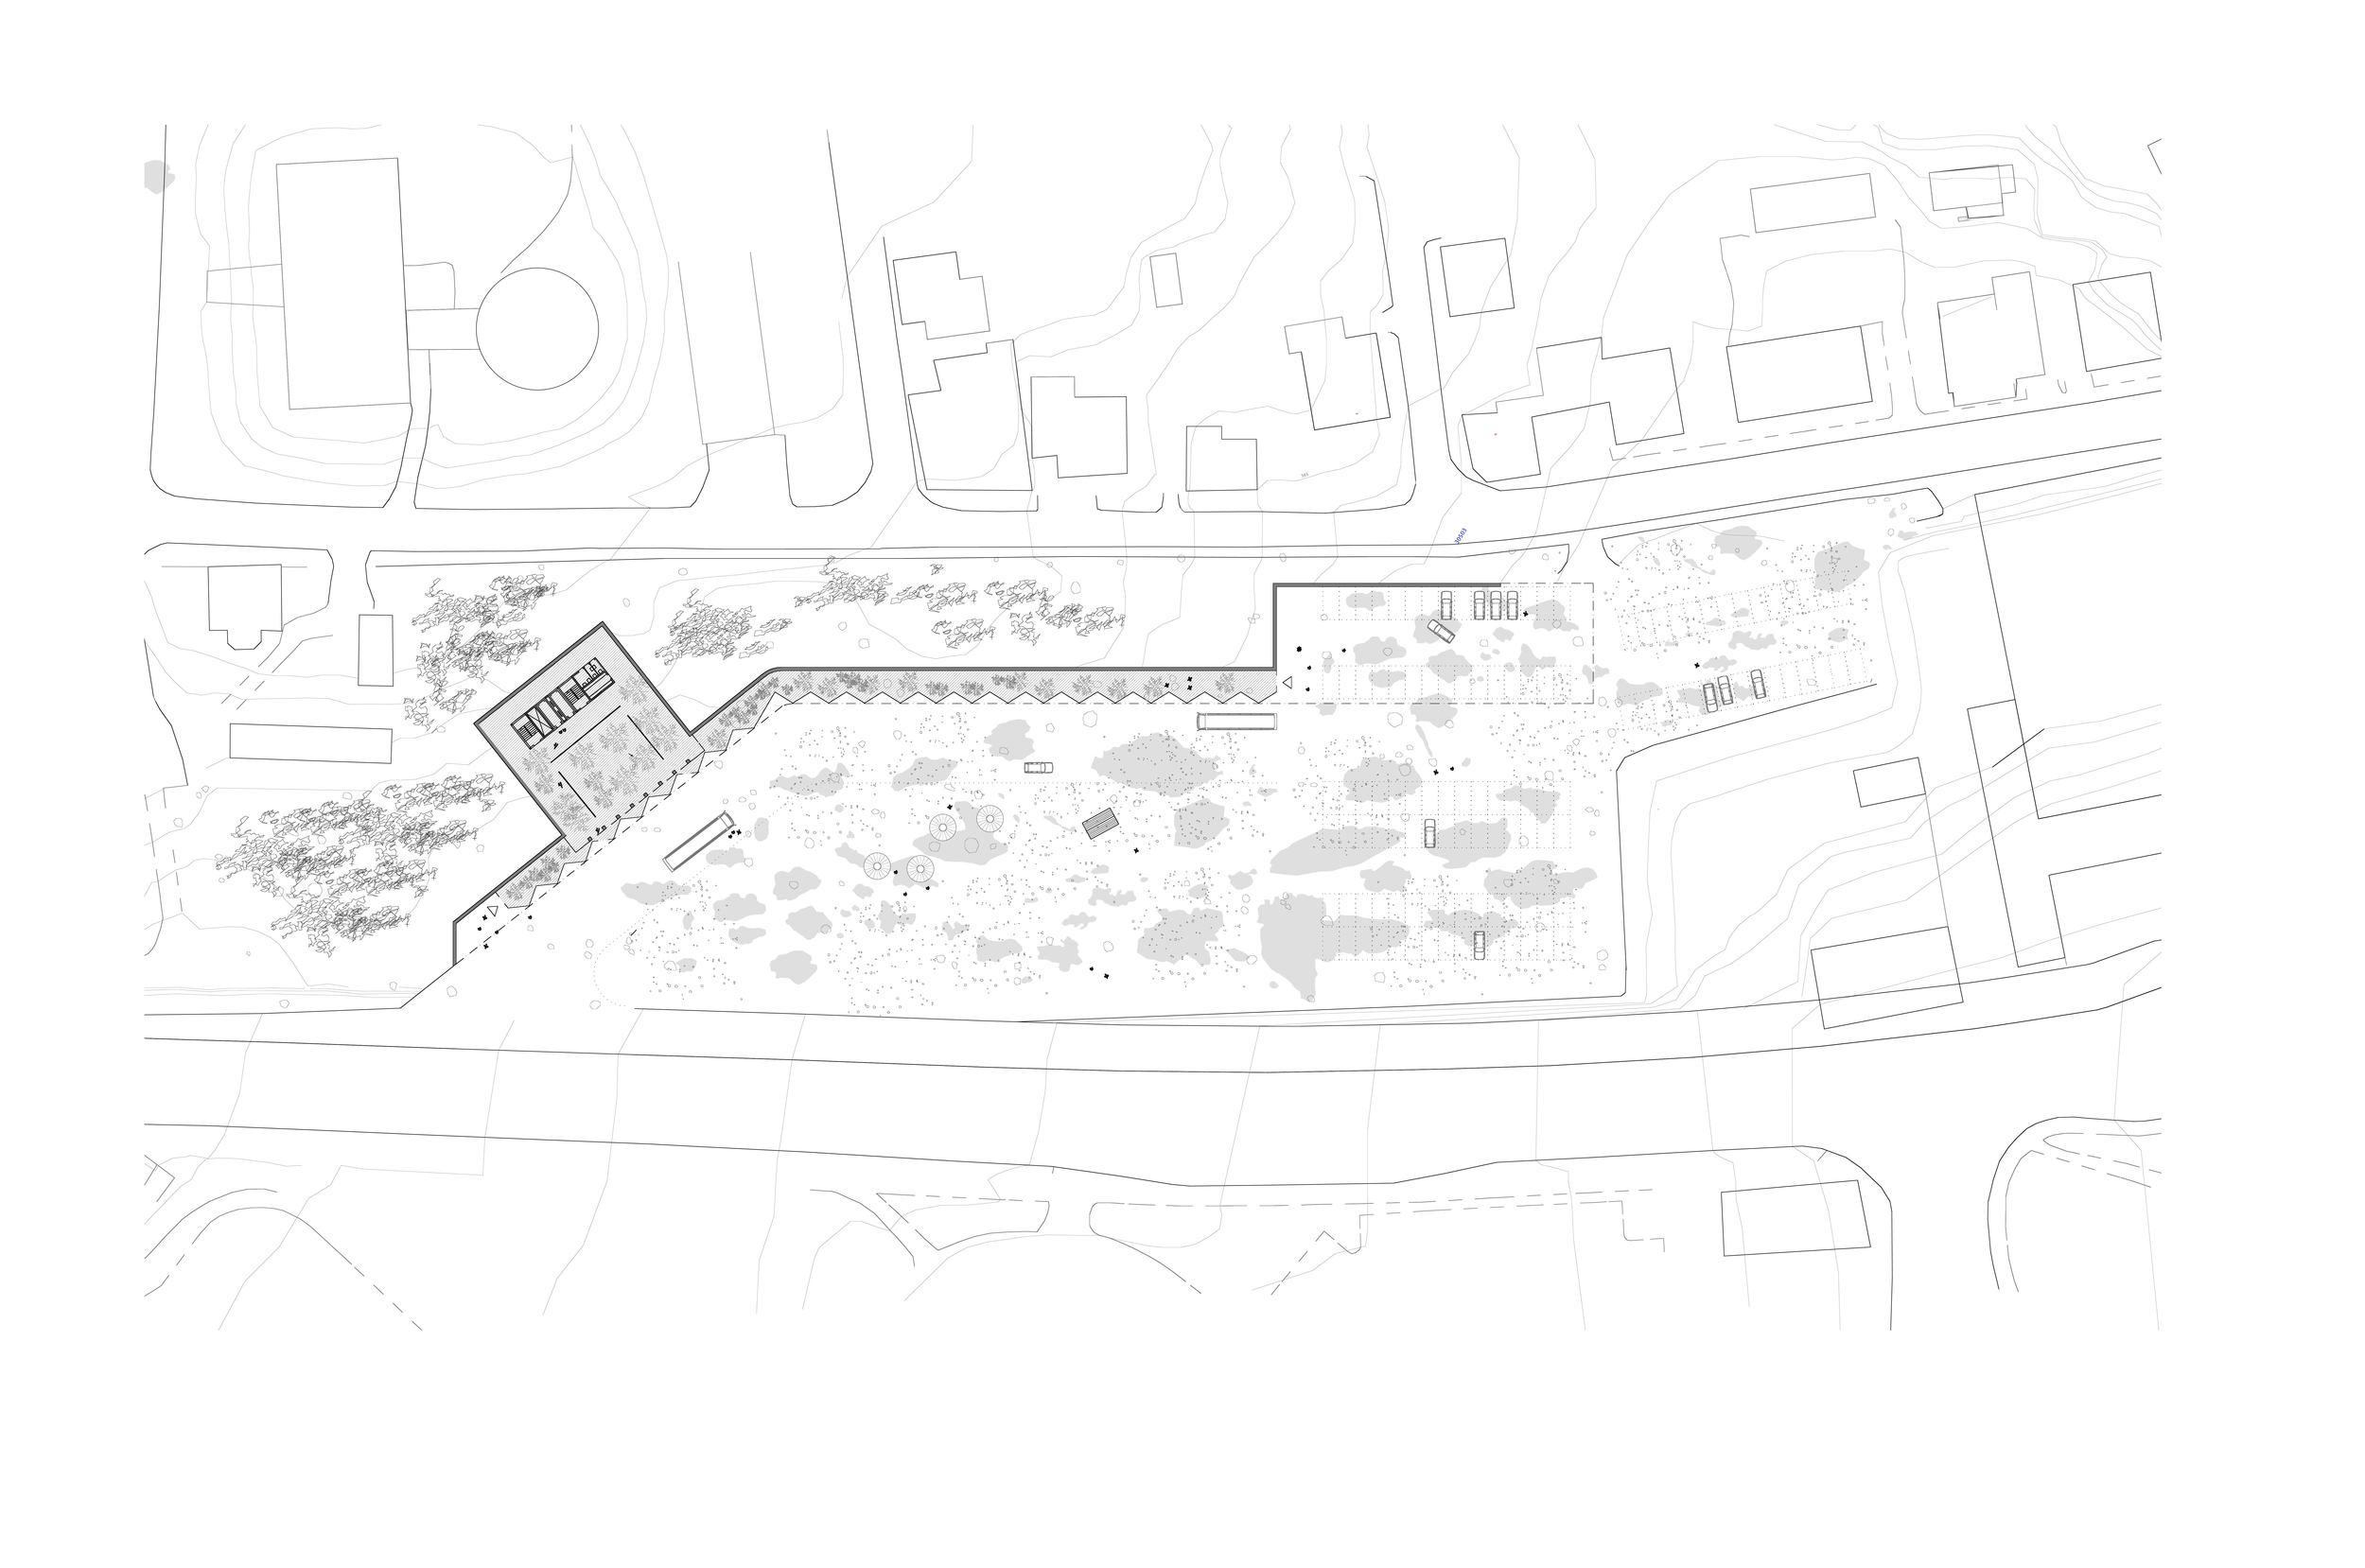 site_plan_experiments _ 1. Etage.jpg